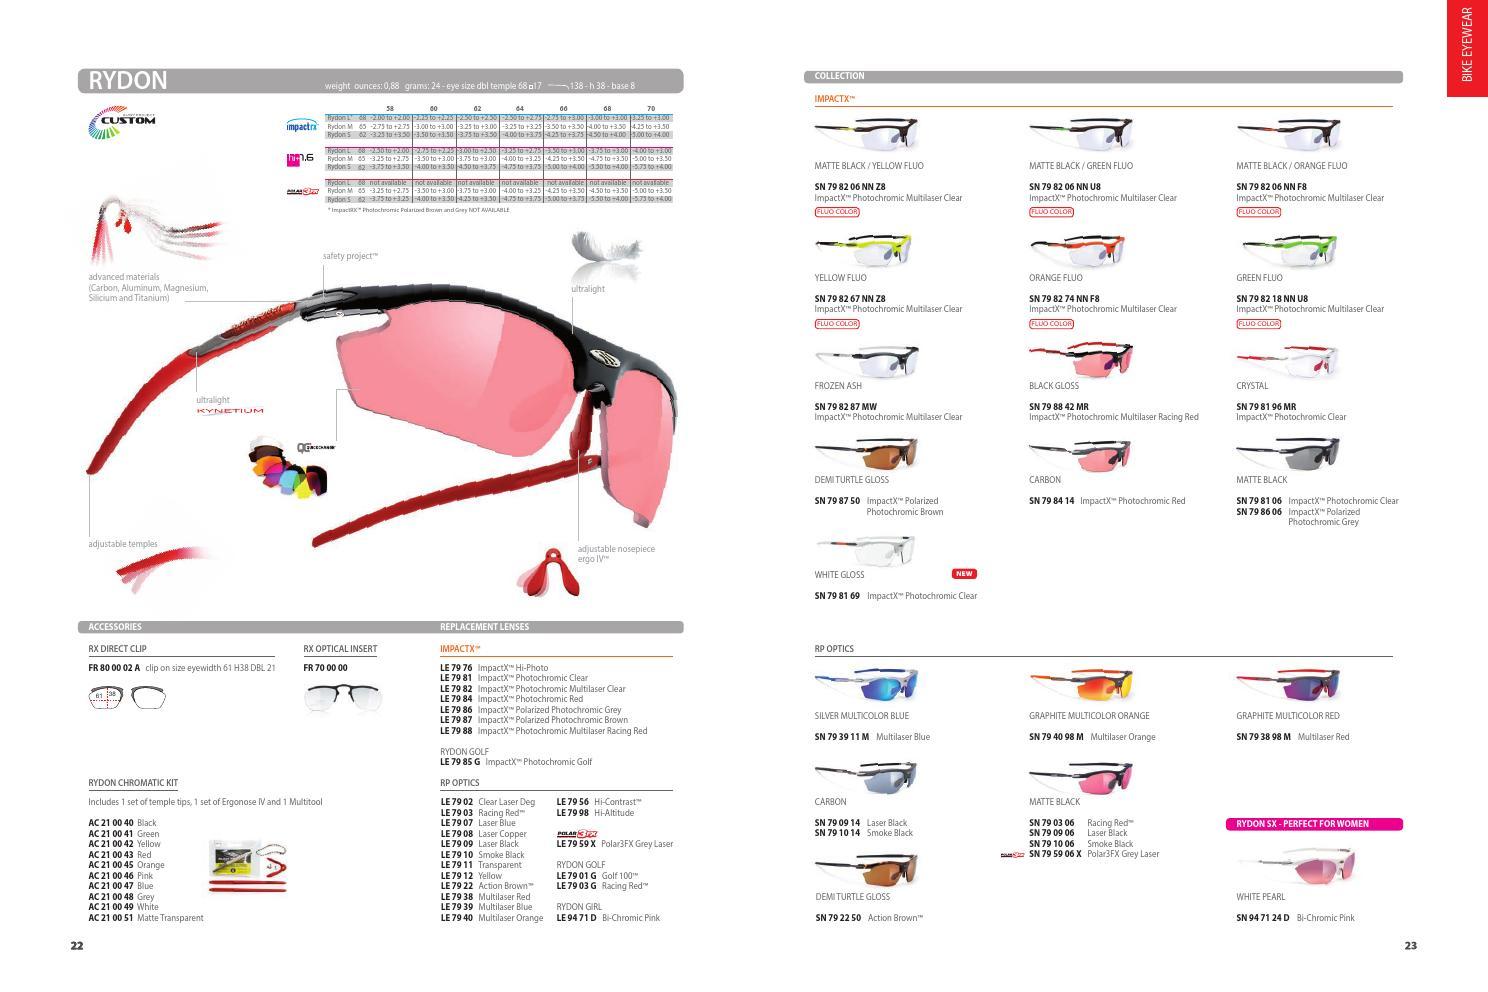 b5365e954dc Rudy Project 2014 Eyewear